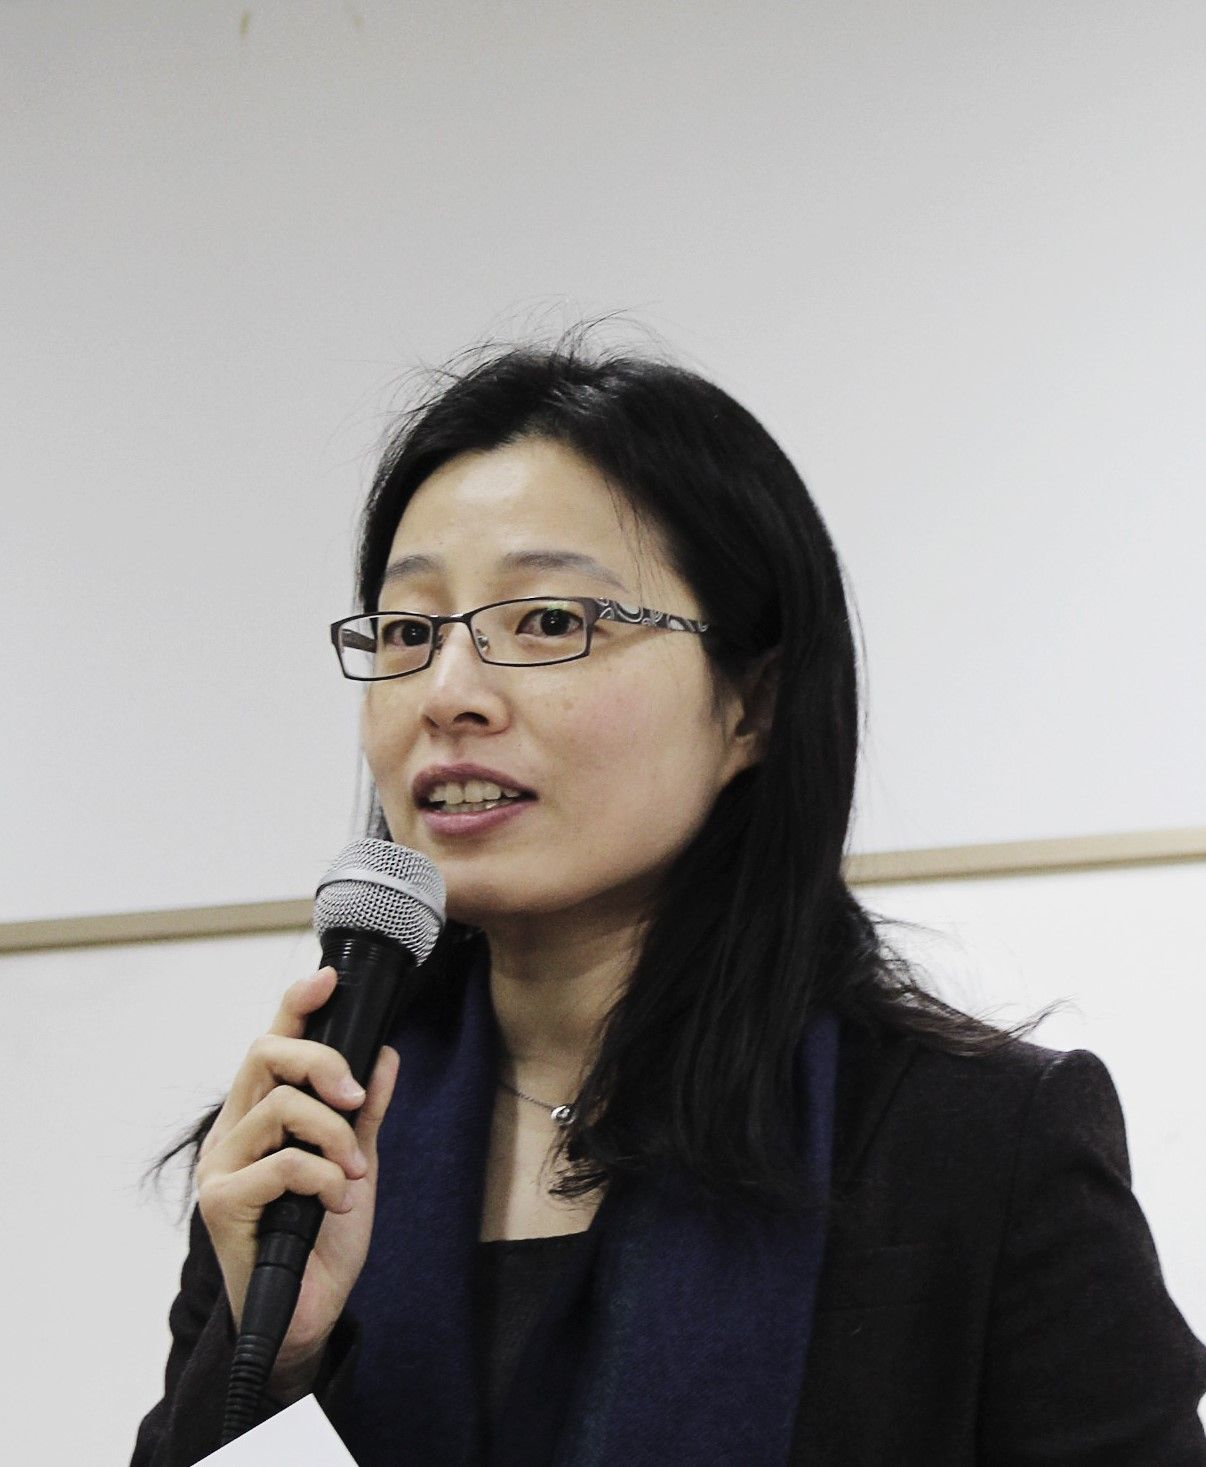 Dr Joo-Young Lee